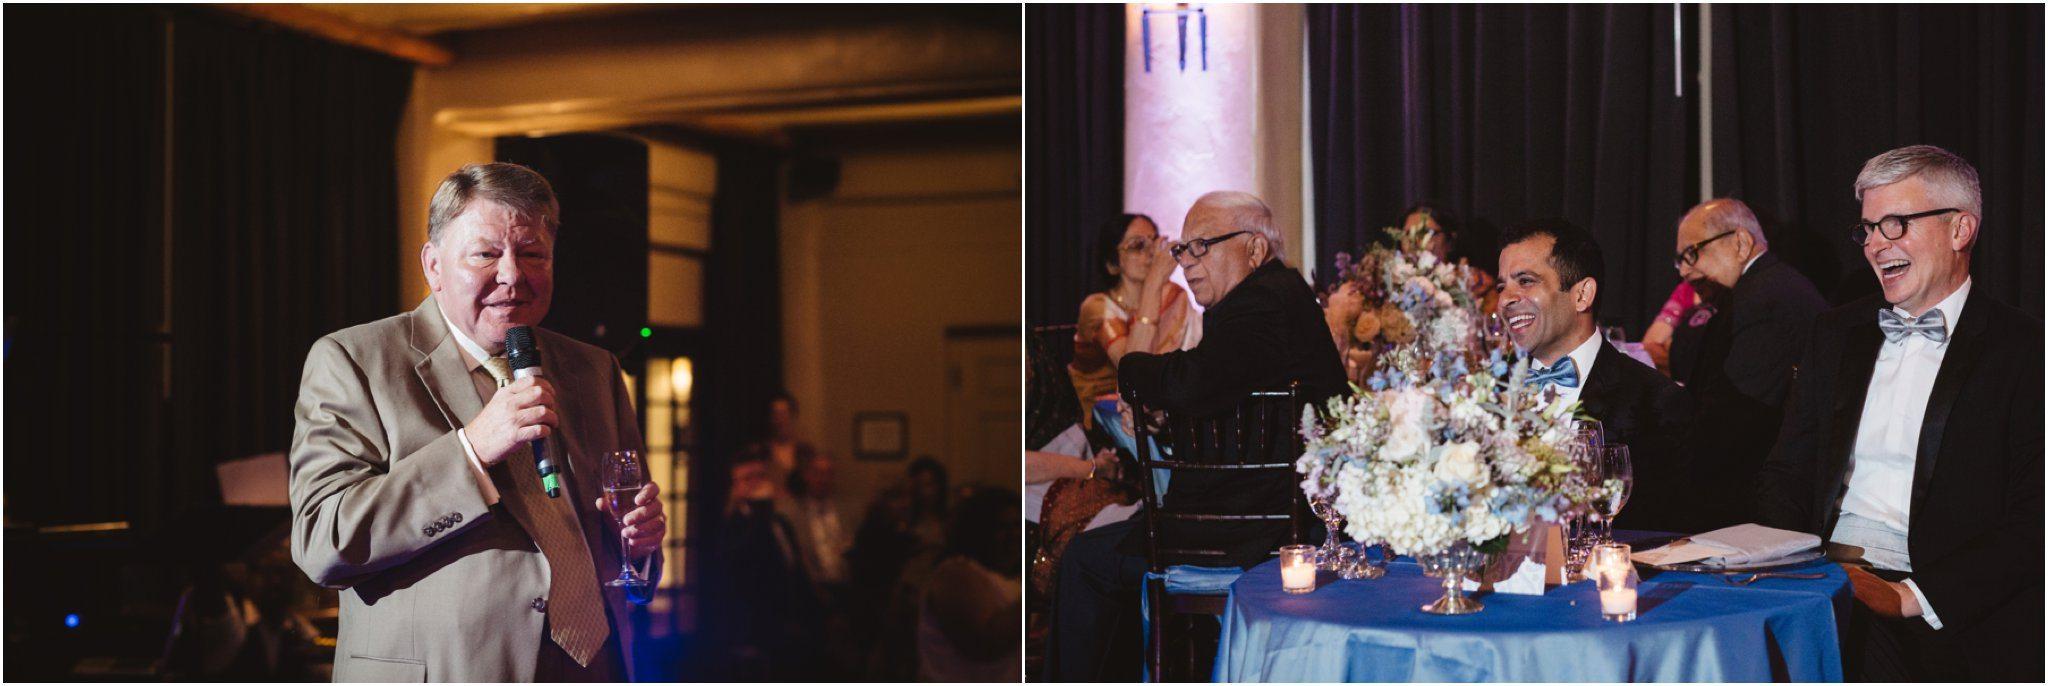 0037new-mexico-same-sex-wedding_santa-fe-wedding-photographer_albuquerque-wedding-photographer_top-photographer_-southwest-wedding-photography_-blue-rose-studio